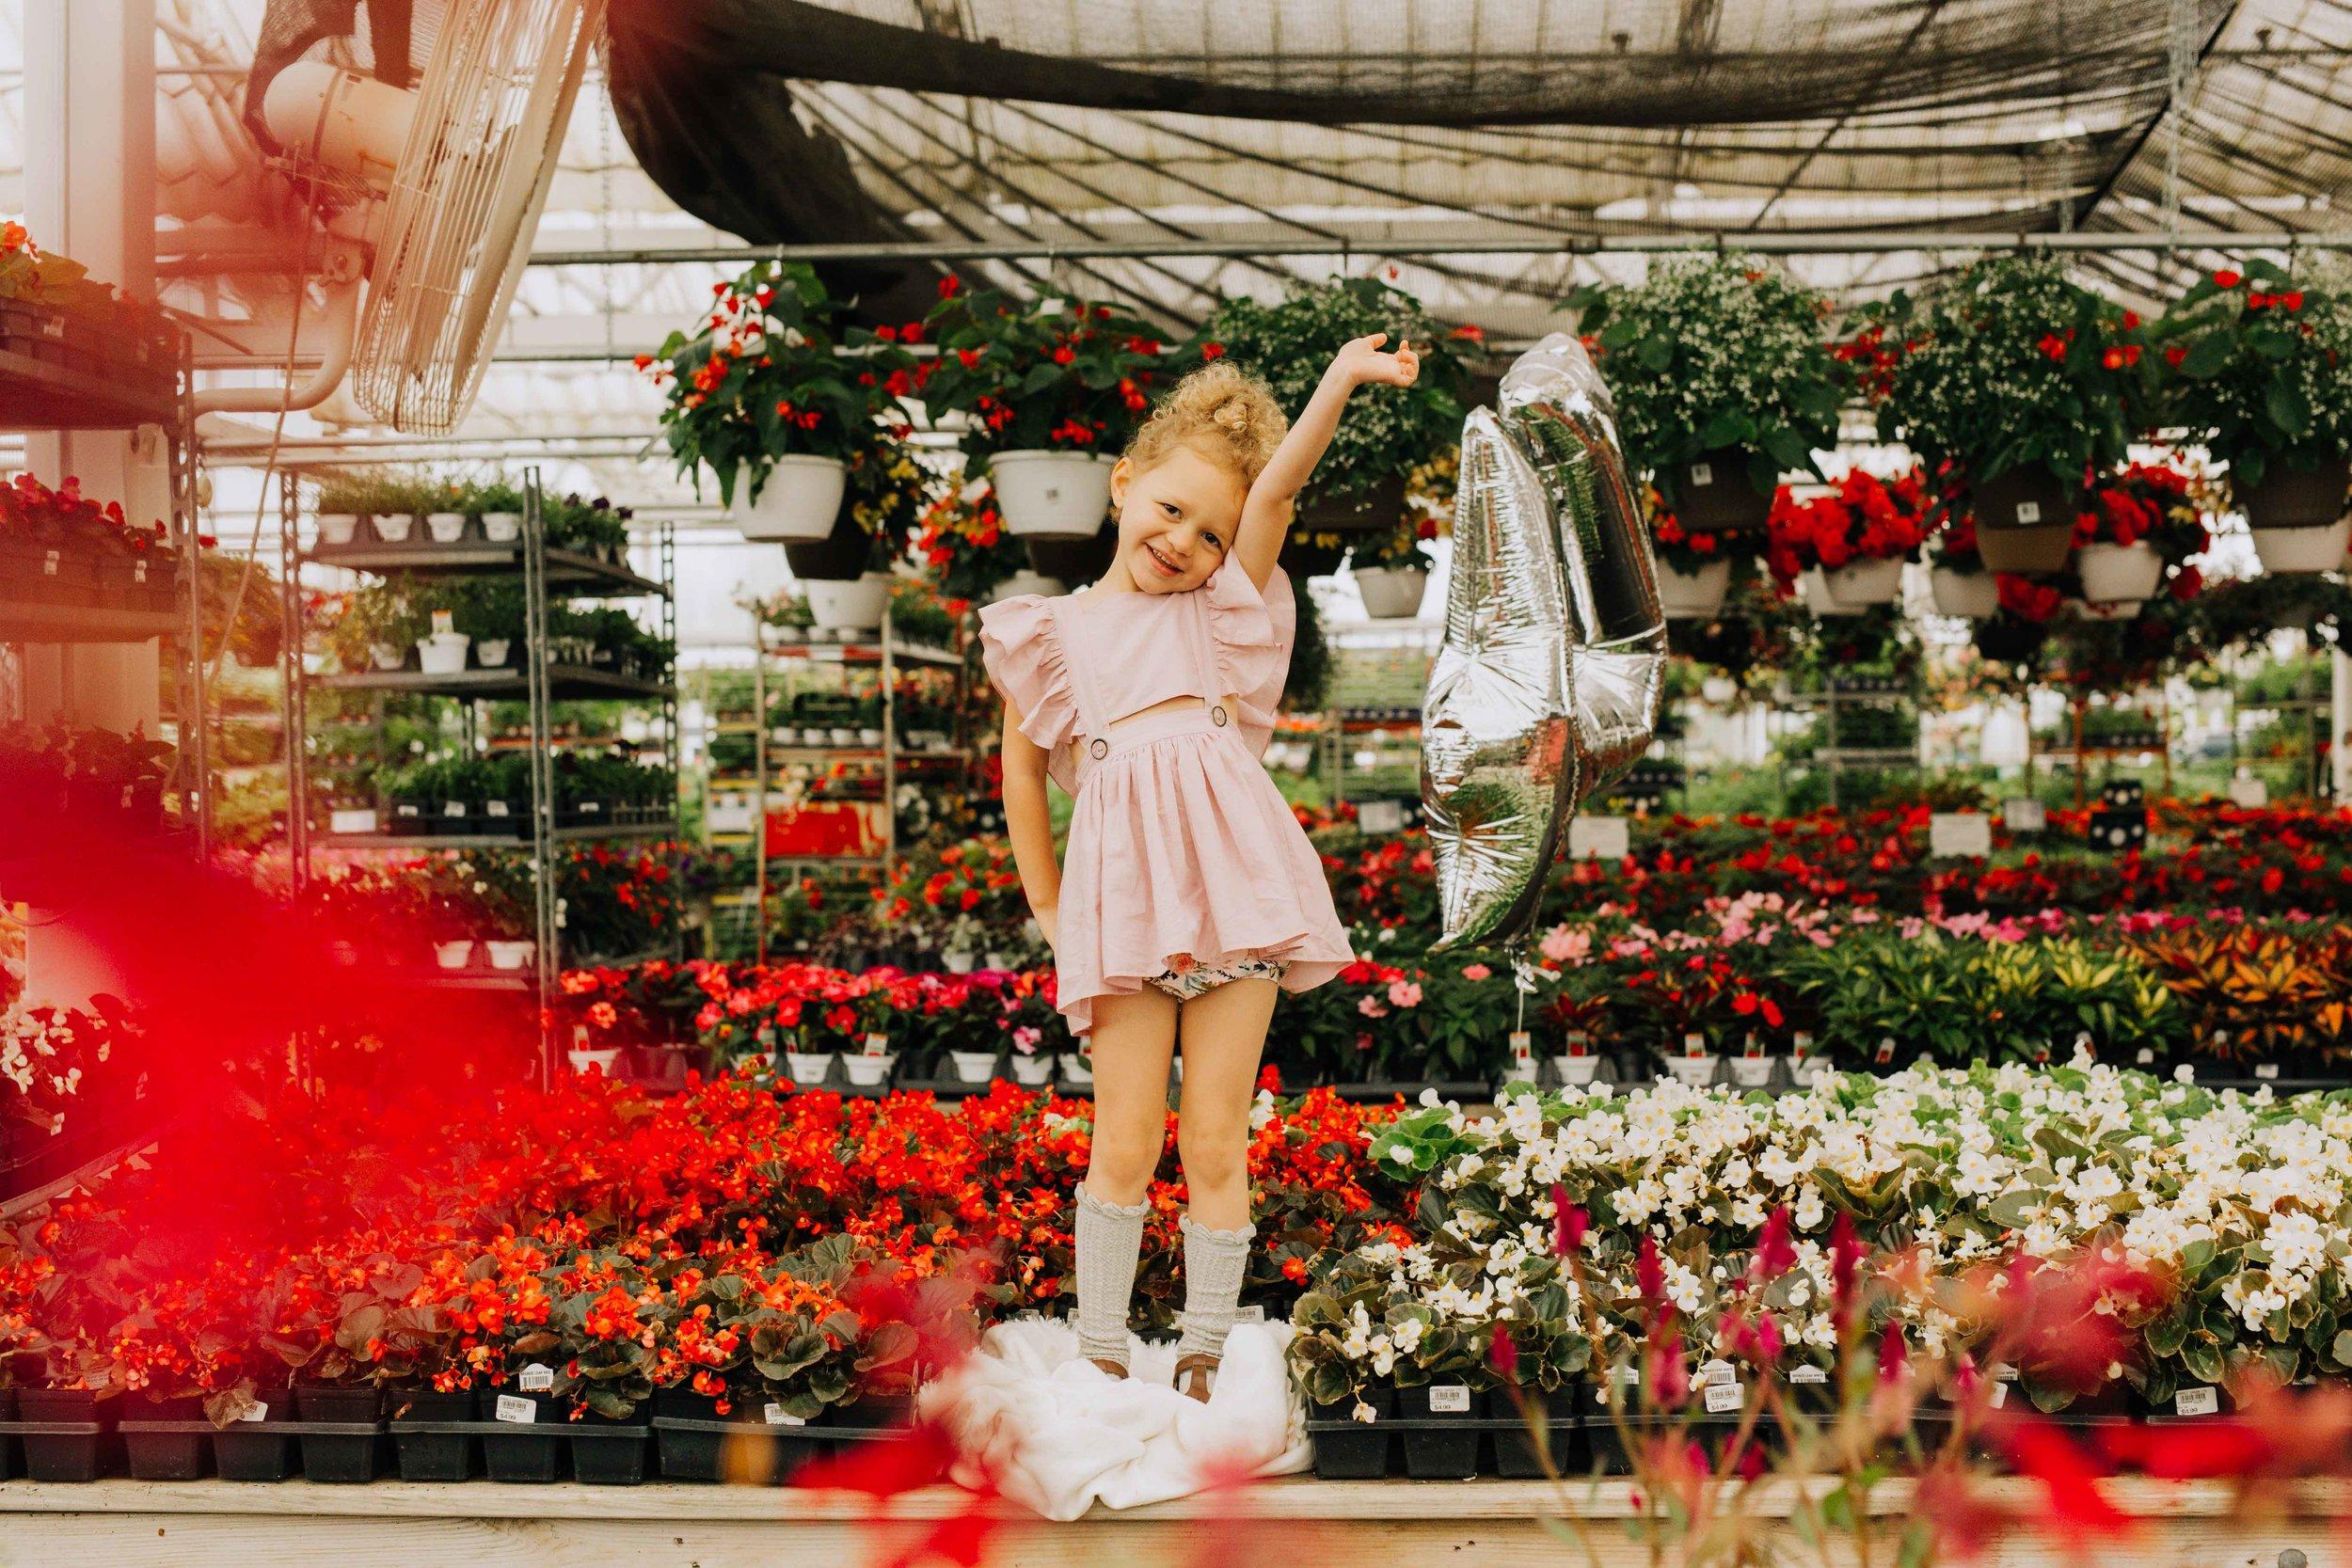 Merrifield-garden-greenhouse-indoor-Jacqueline-Waters-Photography-Red-dress-family- (272).jpg